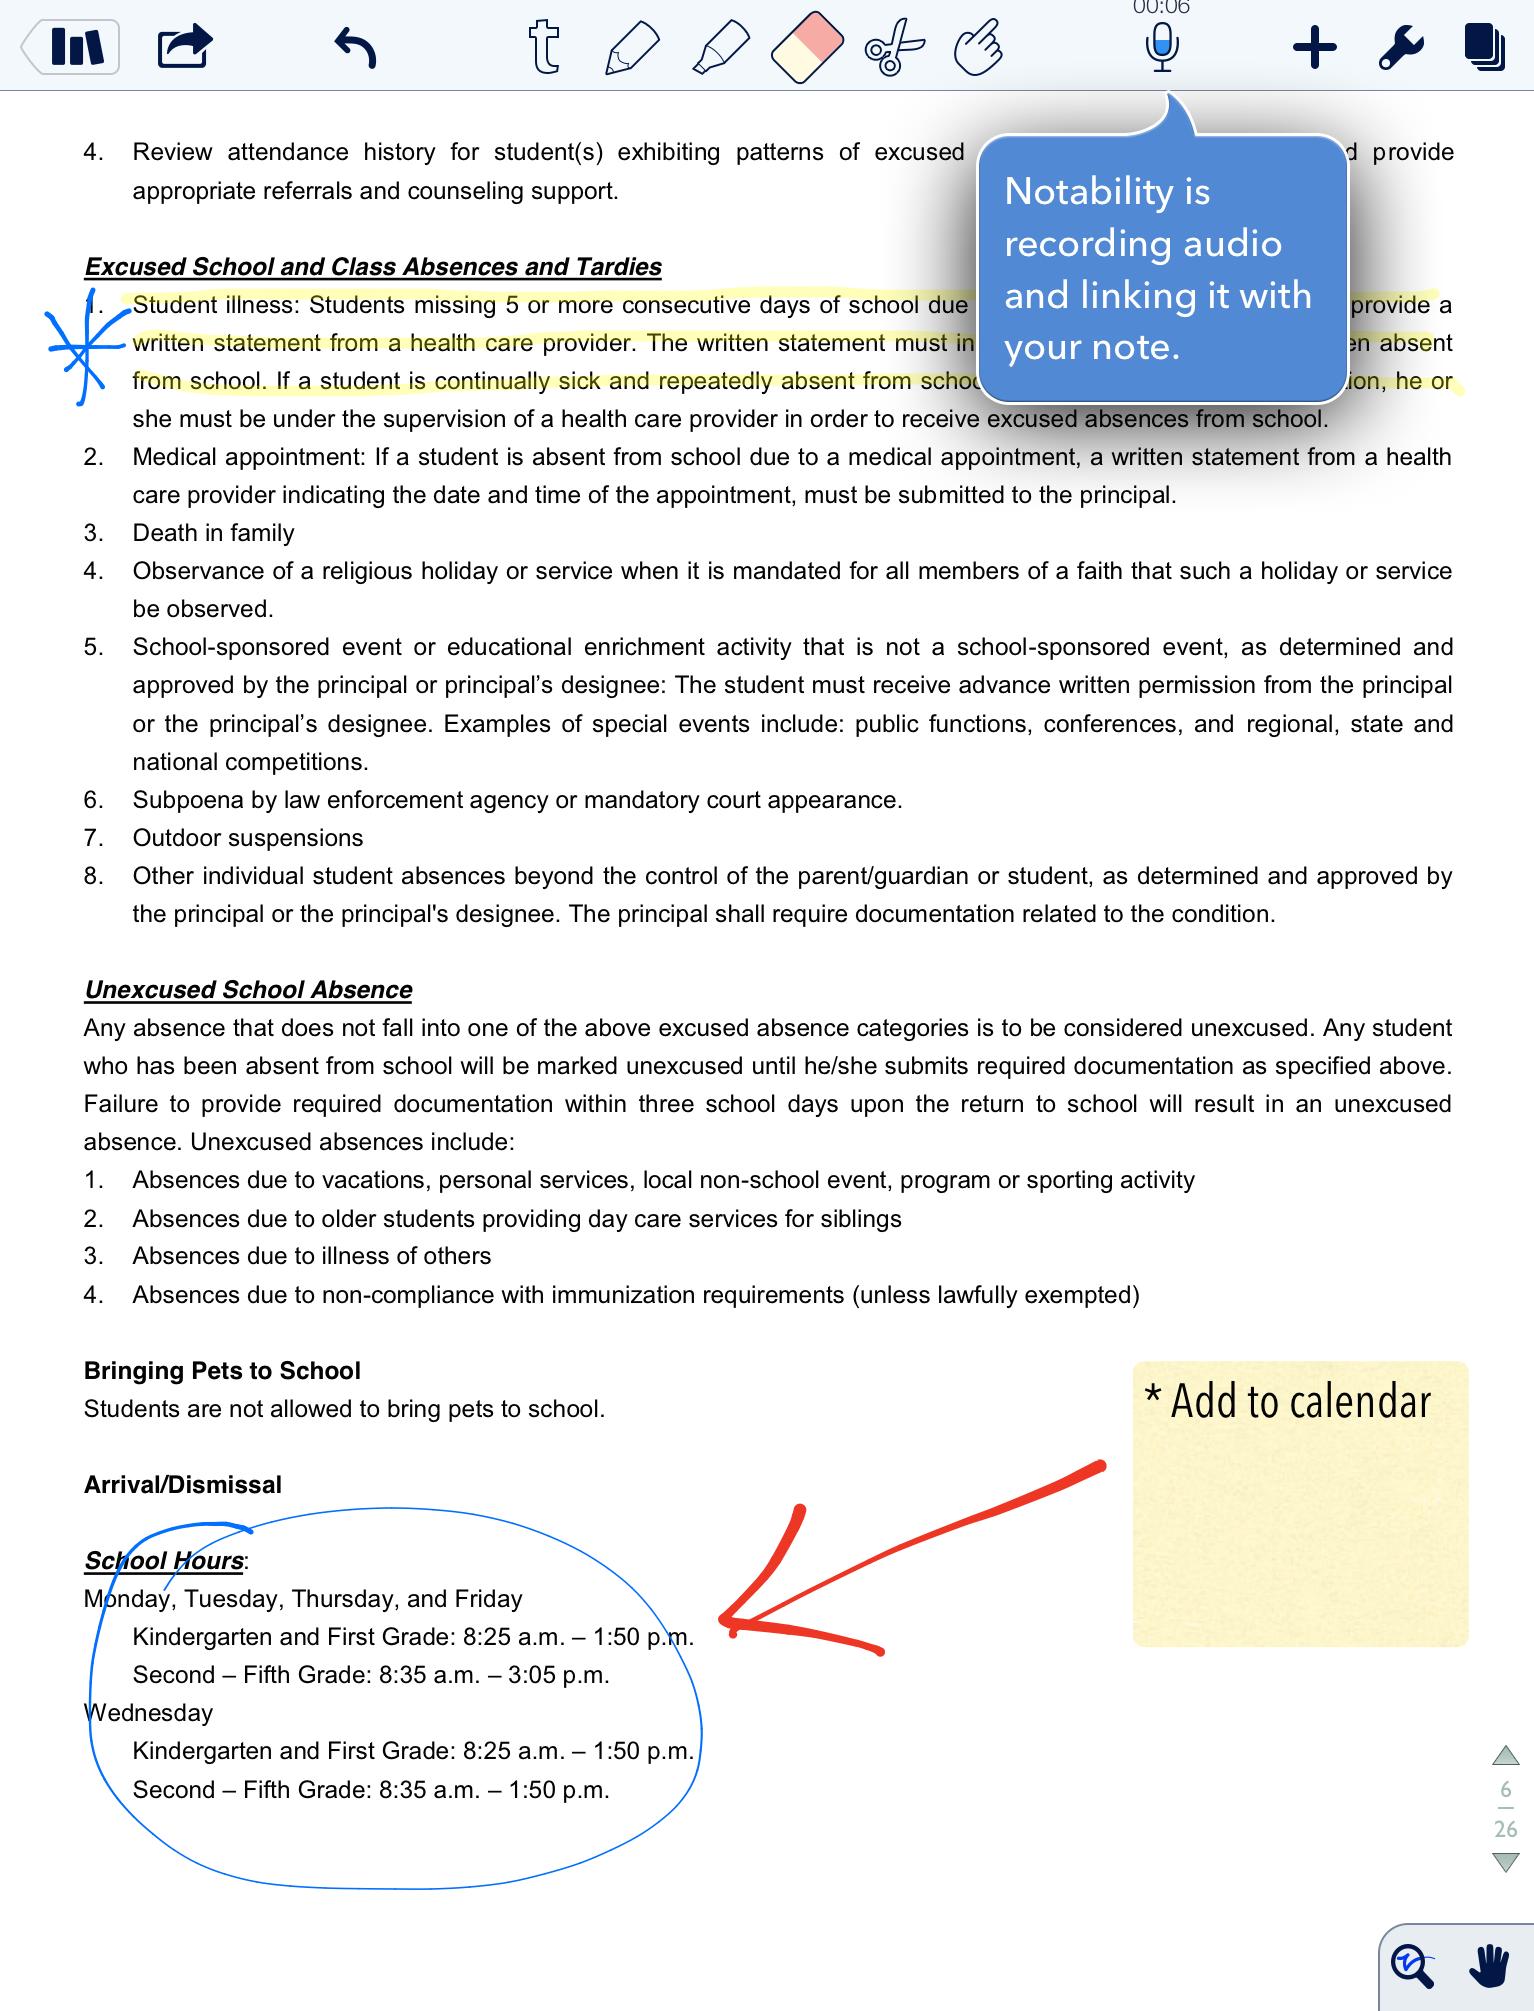 notability screenshot 5